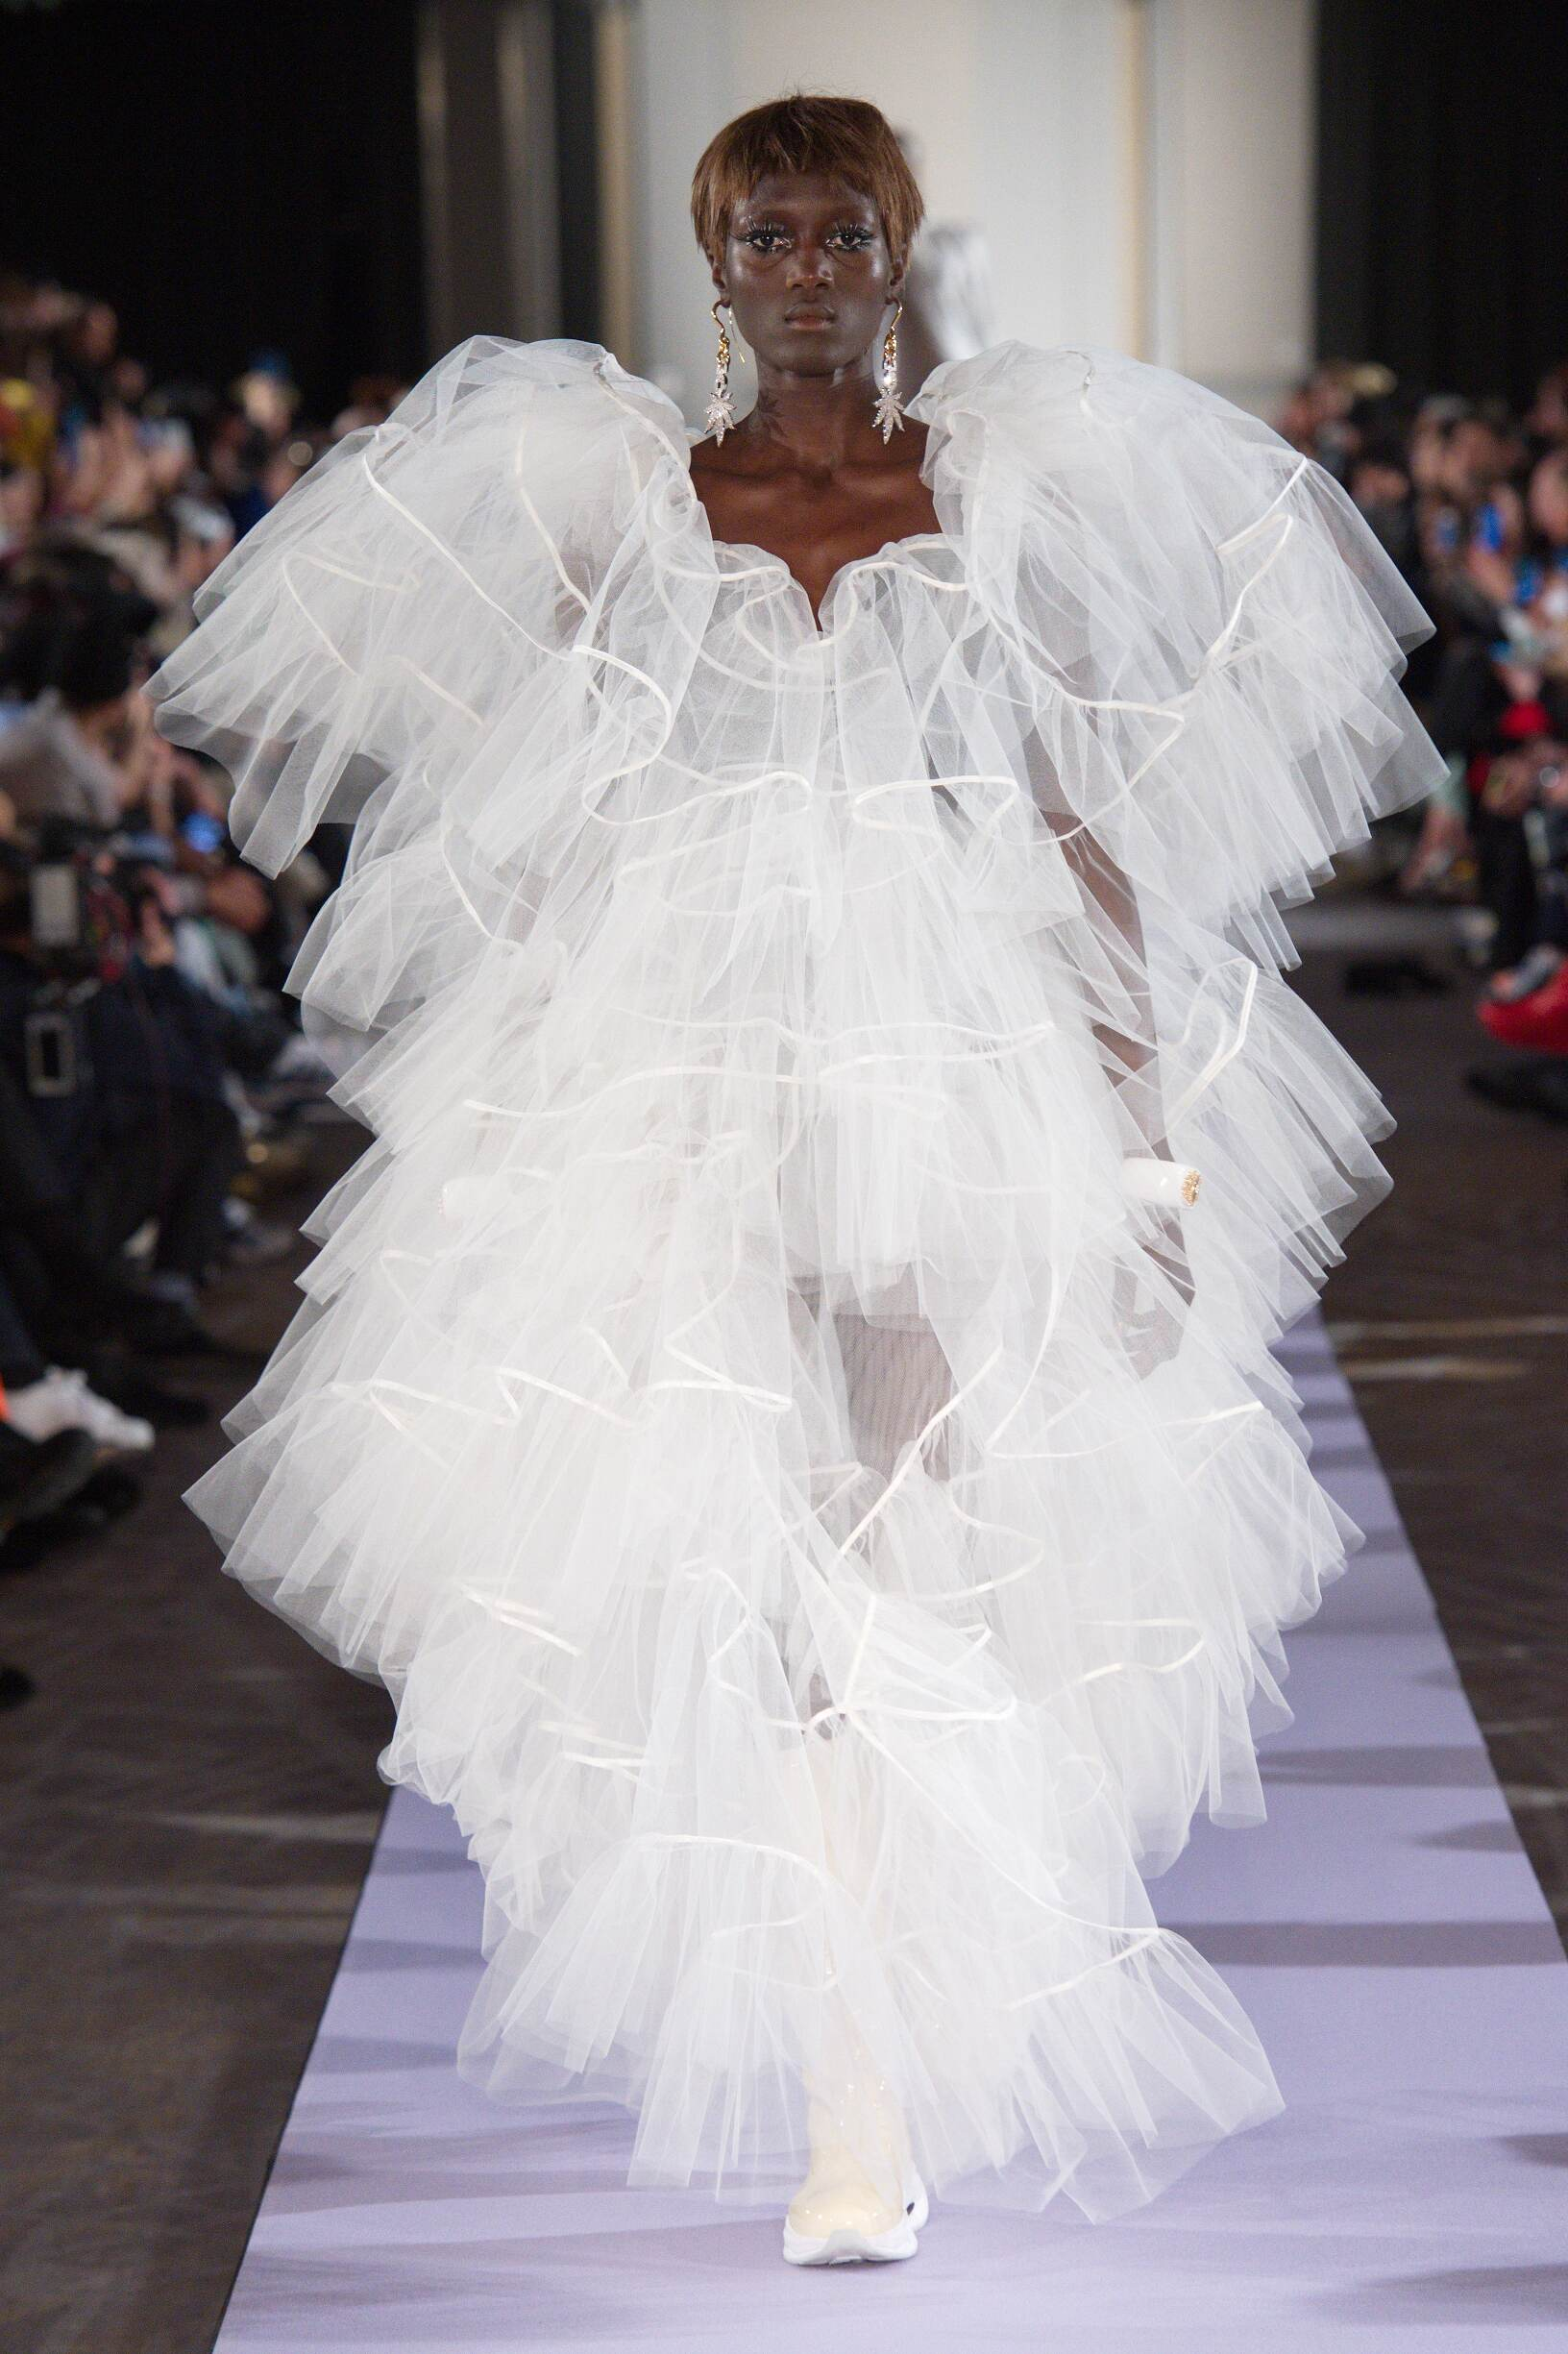 2019 Andreas Kronthaler for Vivienne Westwood Catwalk Paris Fashion Week